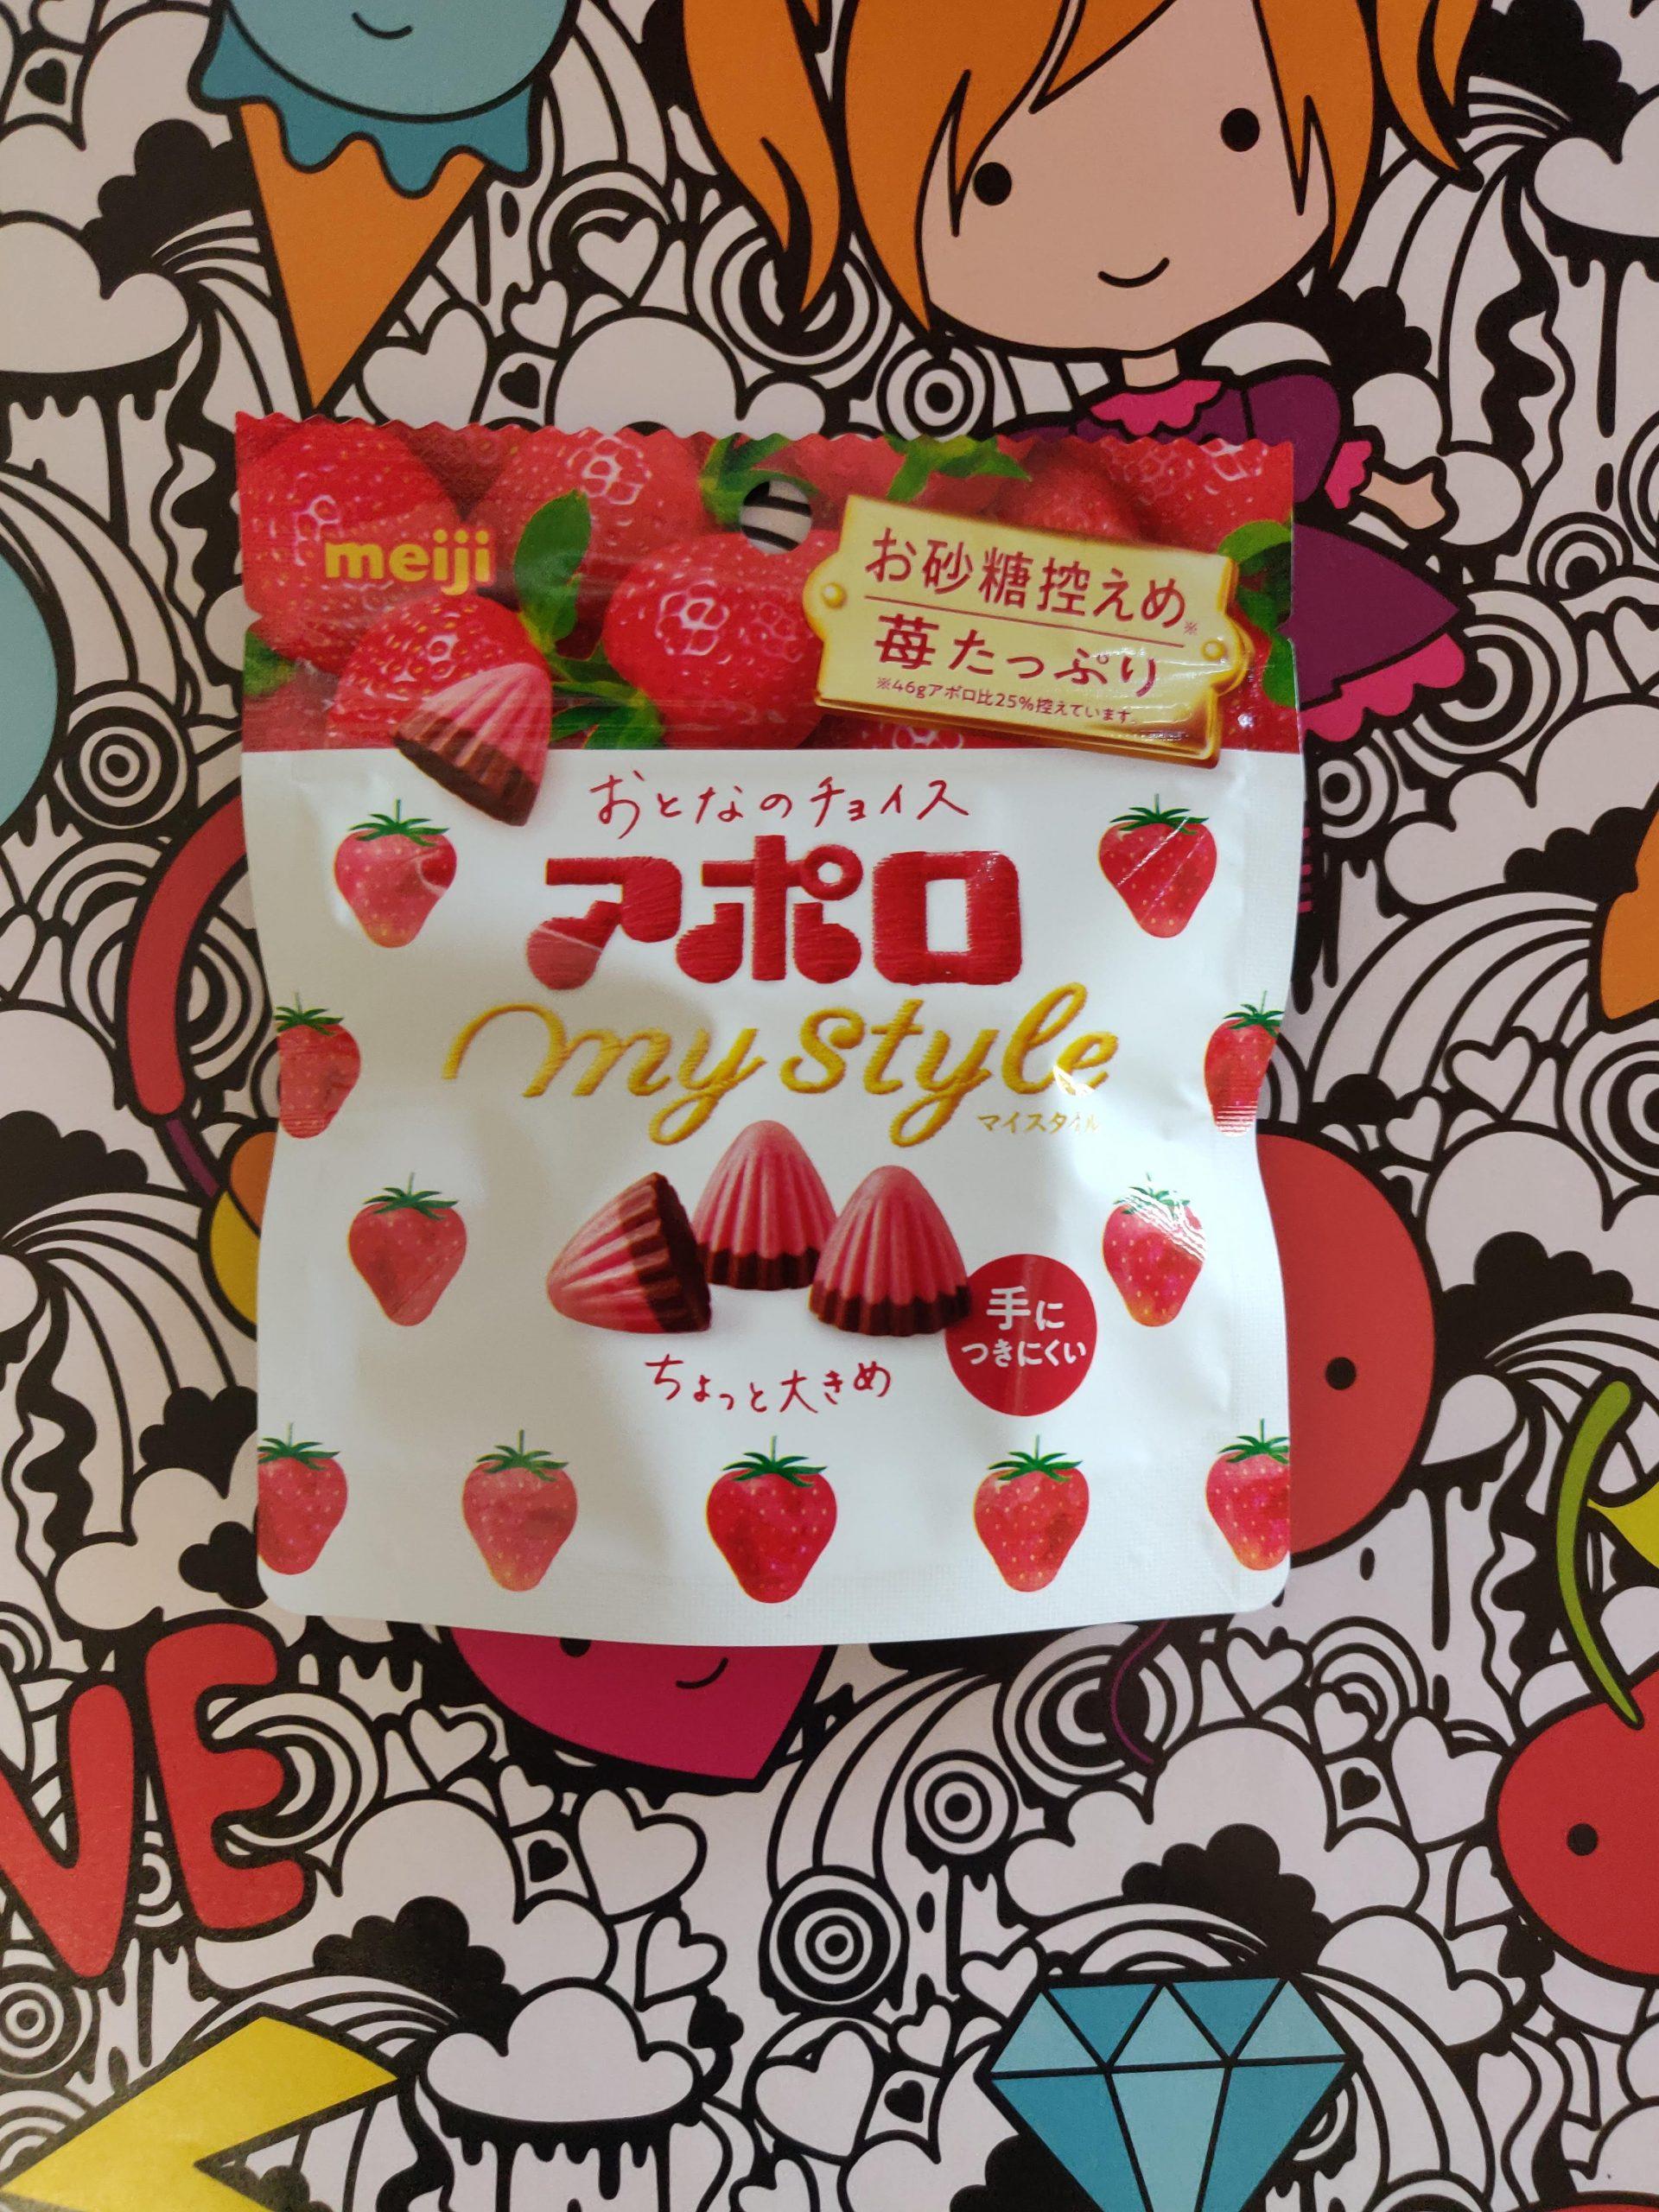 Sequoia Chocolate Strawberry